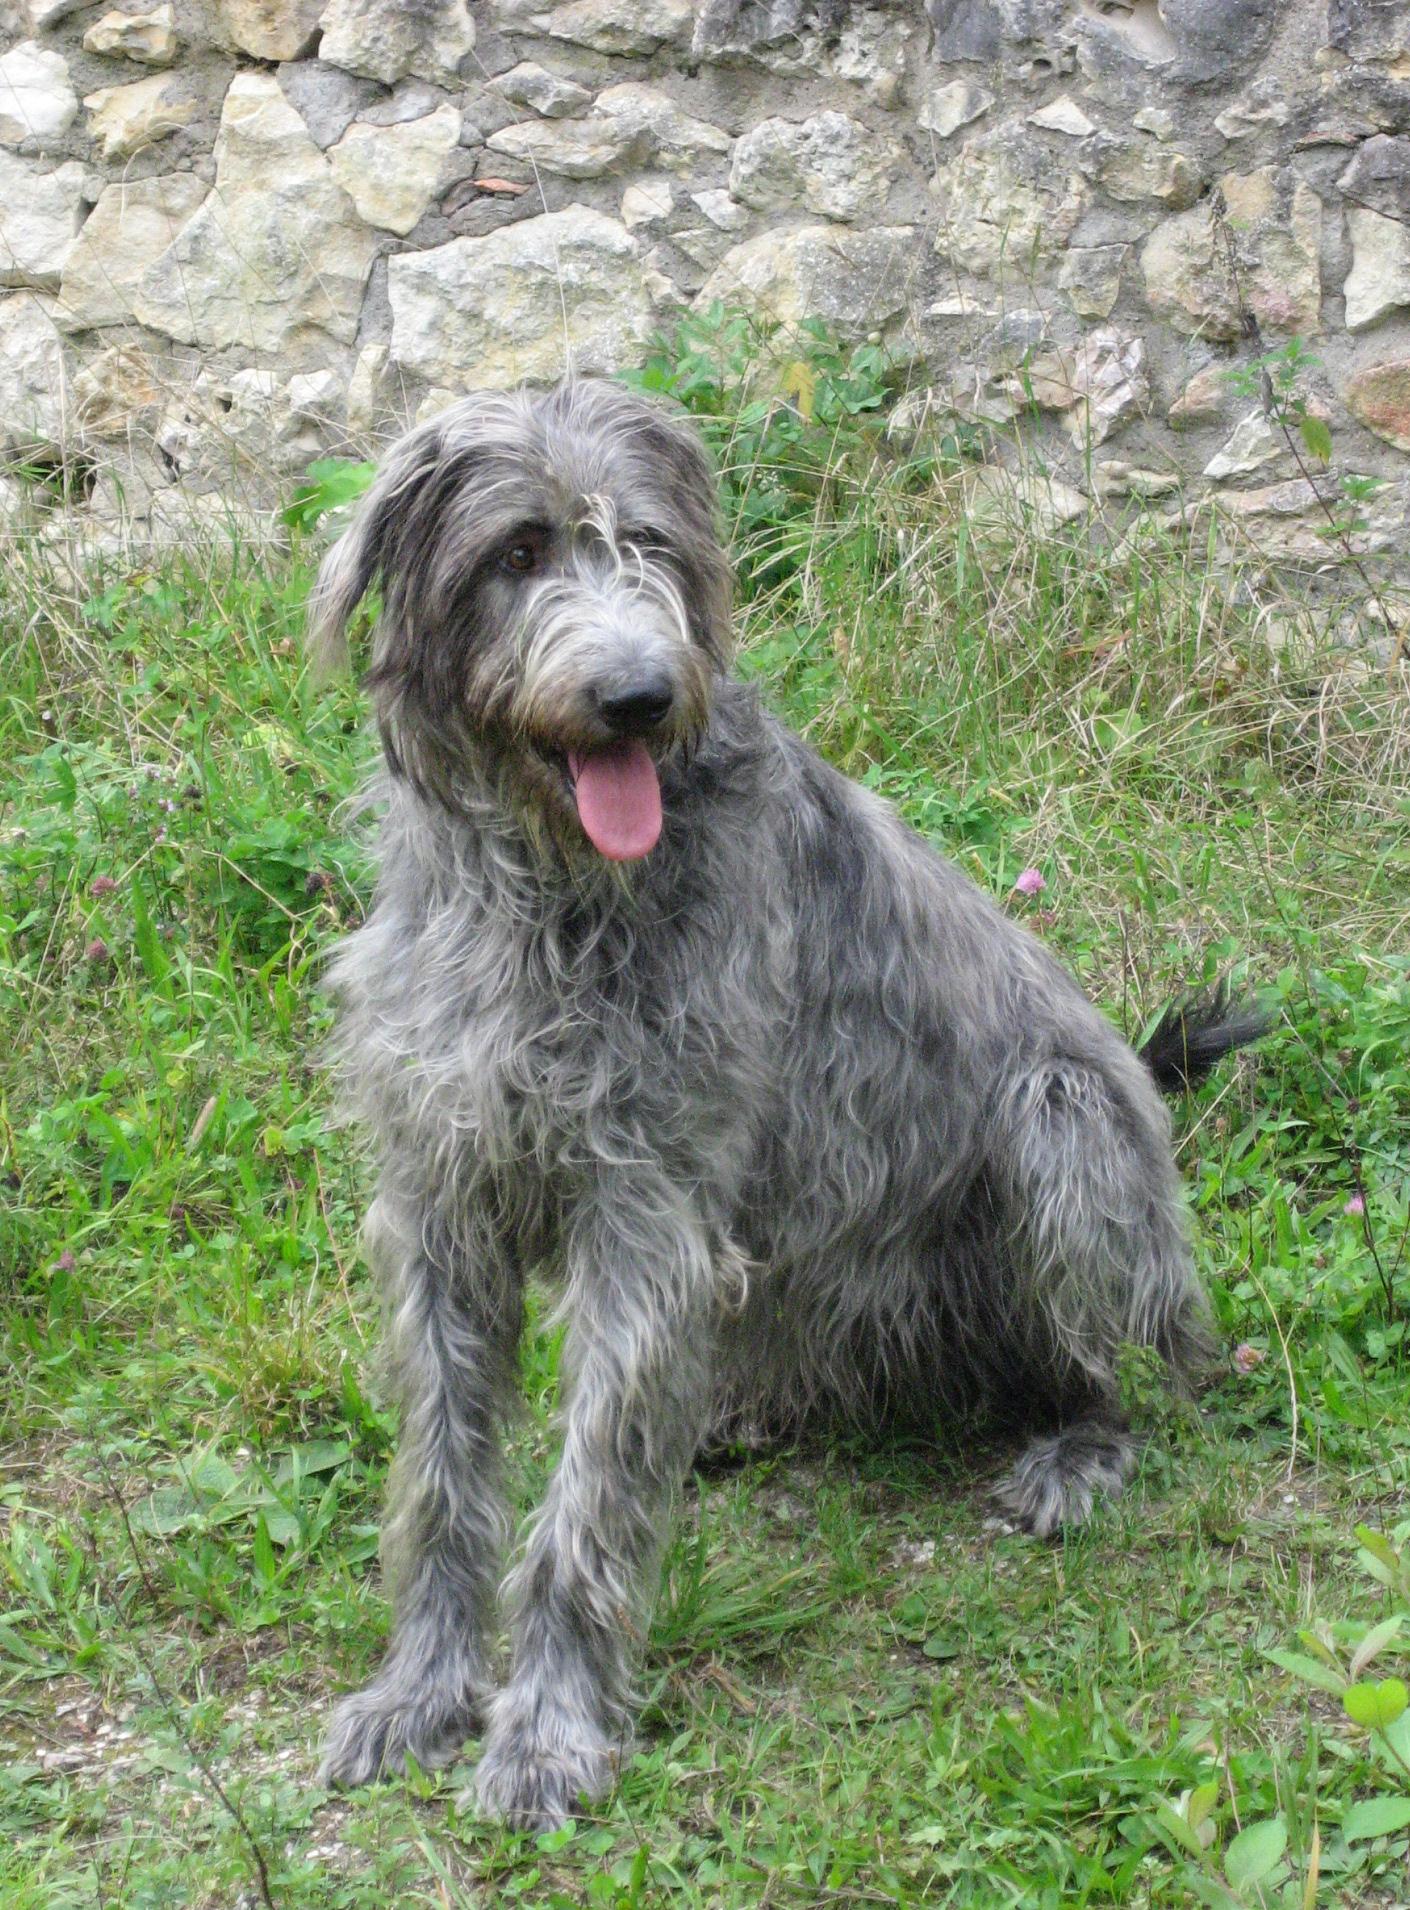 File:Irish Wolfhound.jpg - Wikimedia Commons